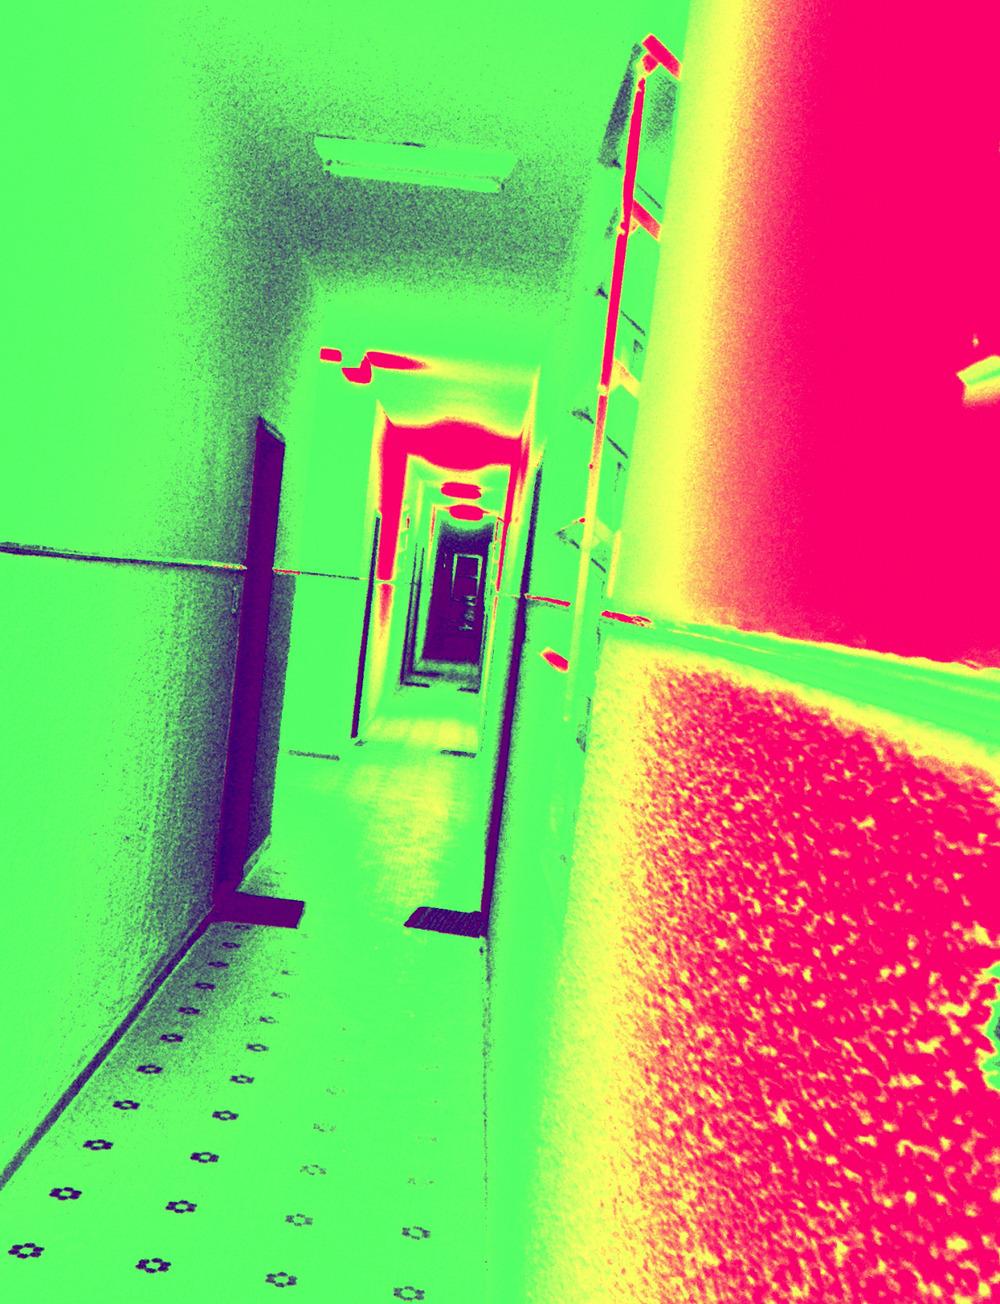 tumblr_negqz7wiN31ta8akho1_1280.jpg